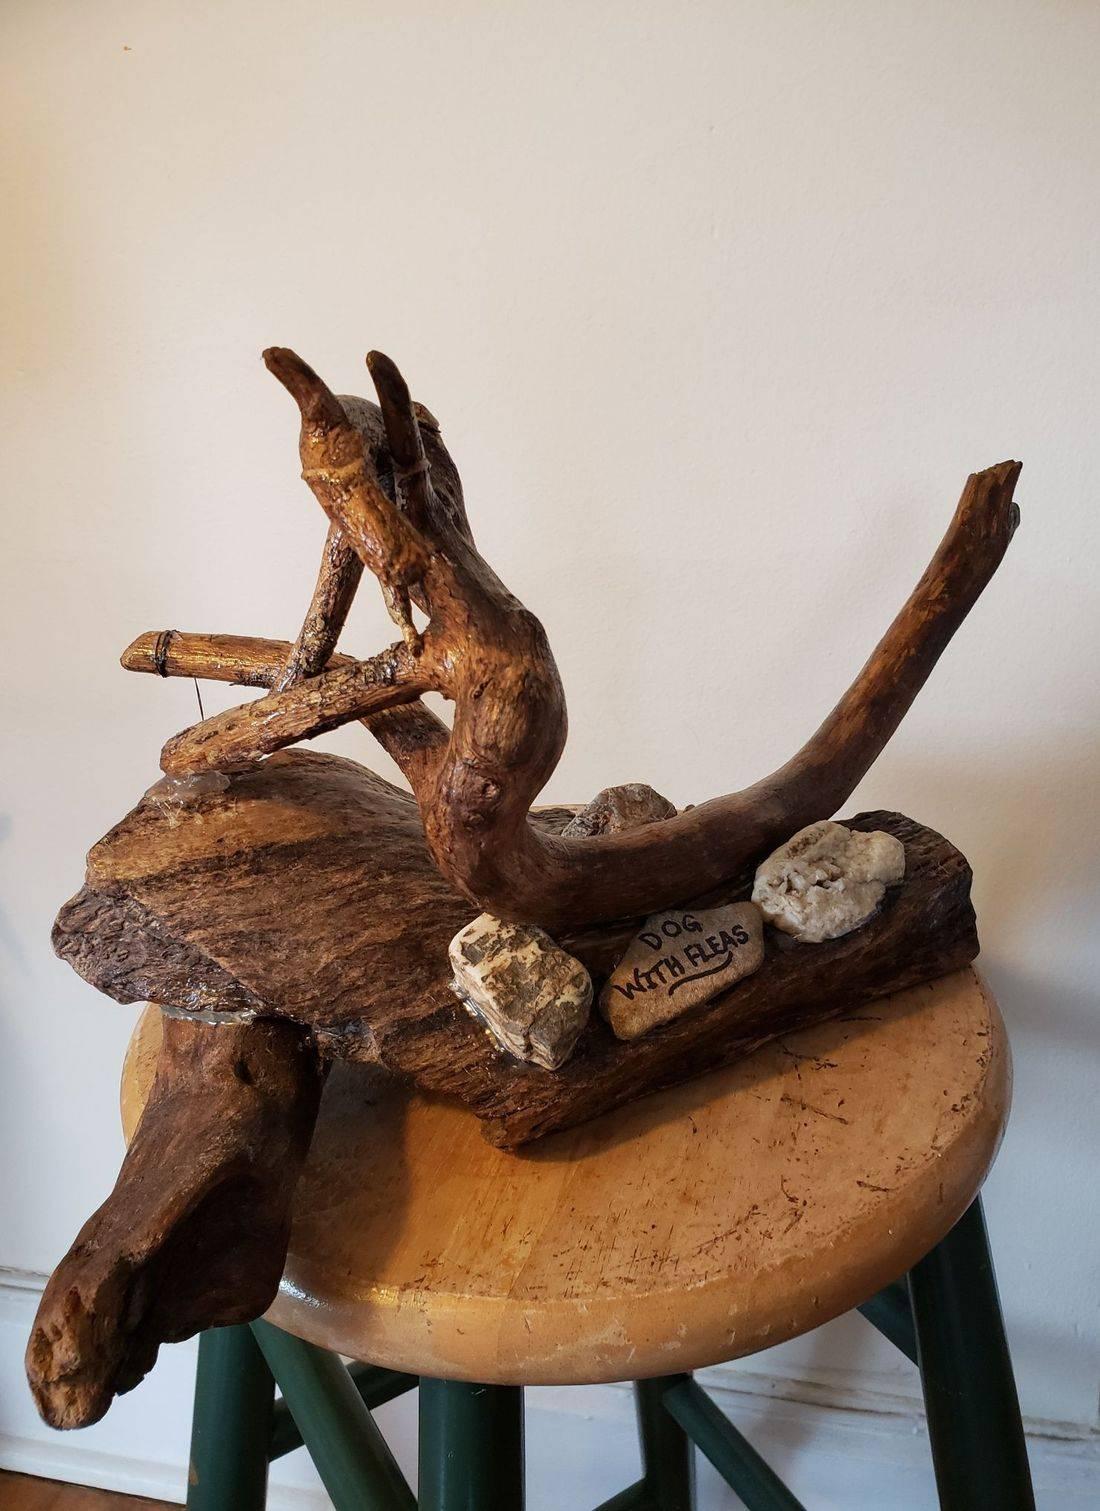 Art, driftwood, shells, stones, rocks, sea glass, river glass, eclectic, local art